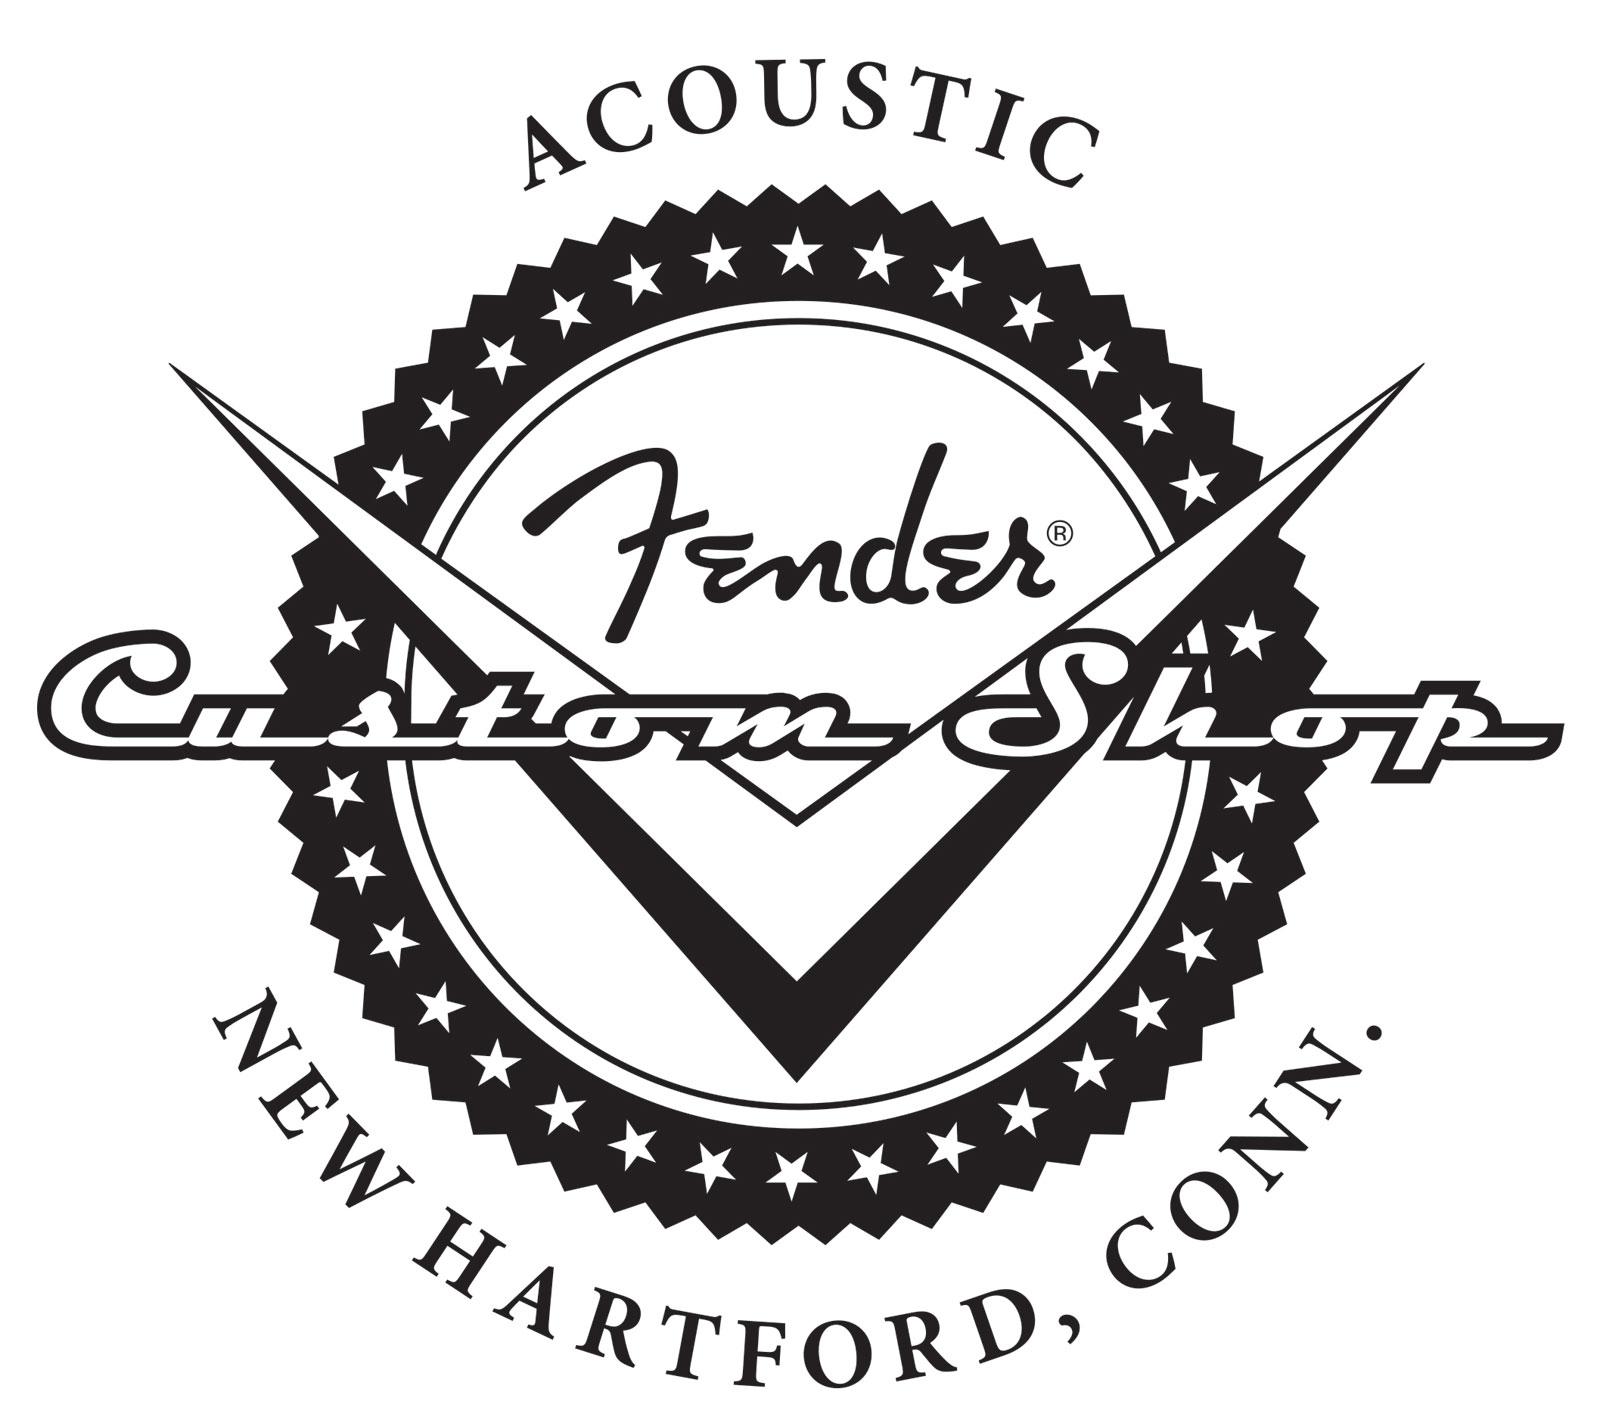 gibson rd artist guitar auto electrical wiring diagramdentro de la acoustic custom shop u2026